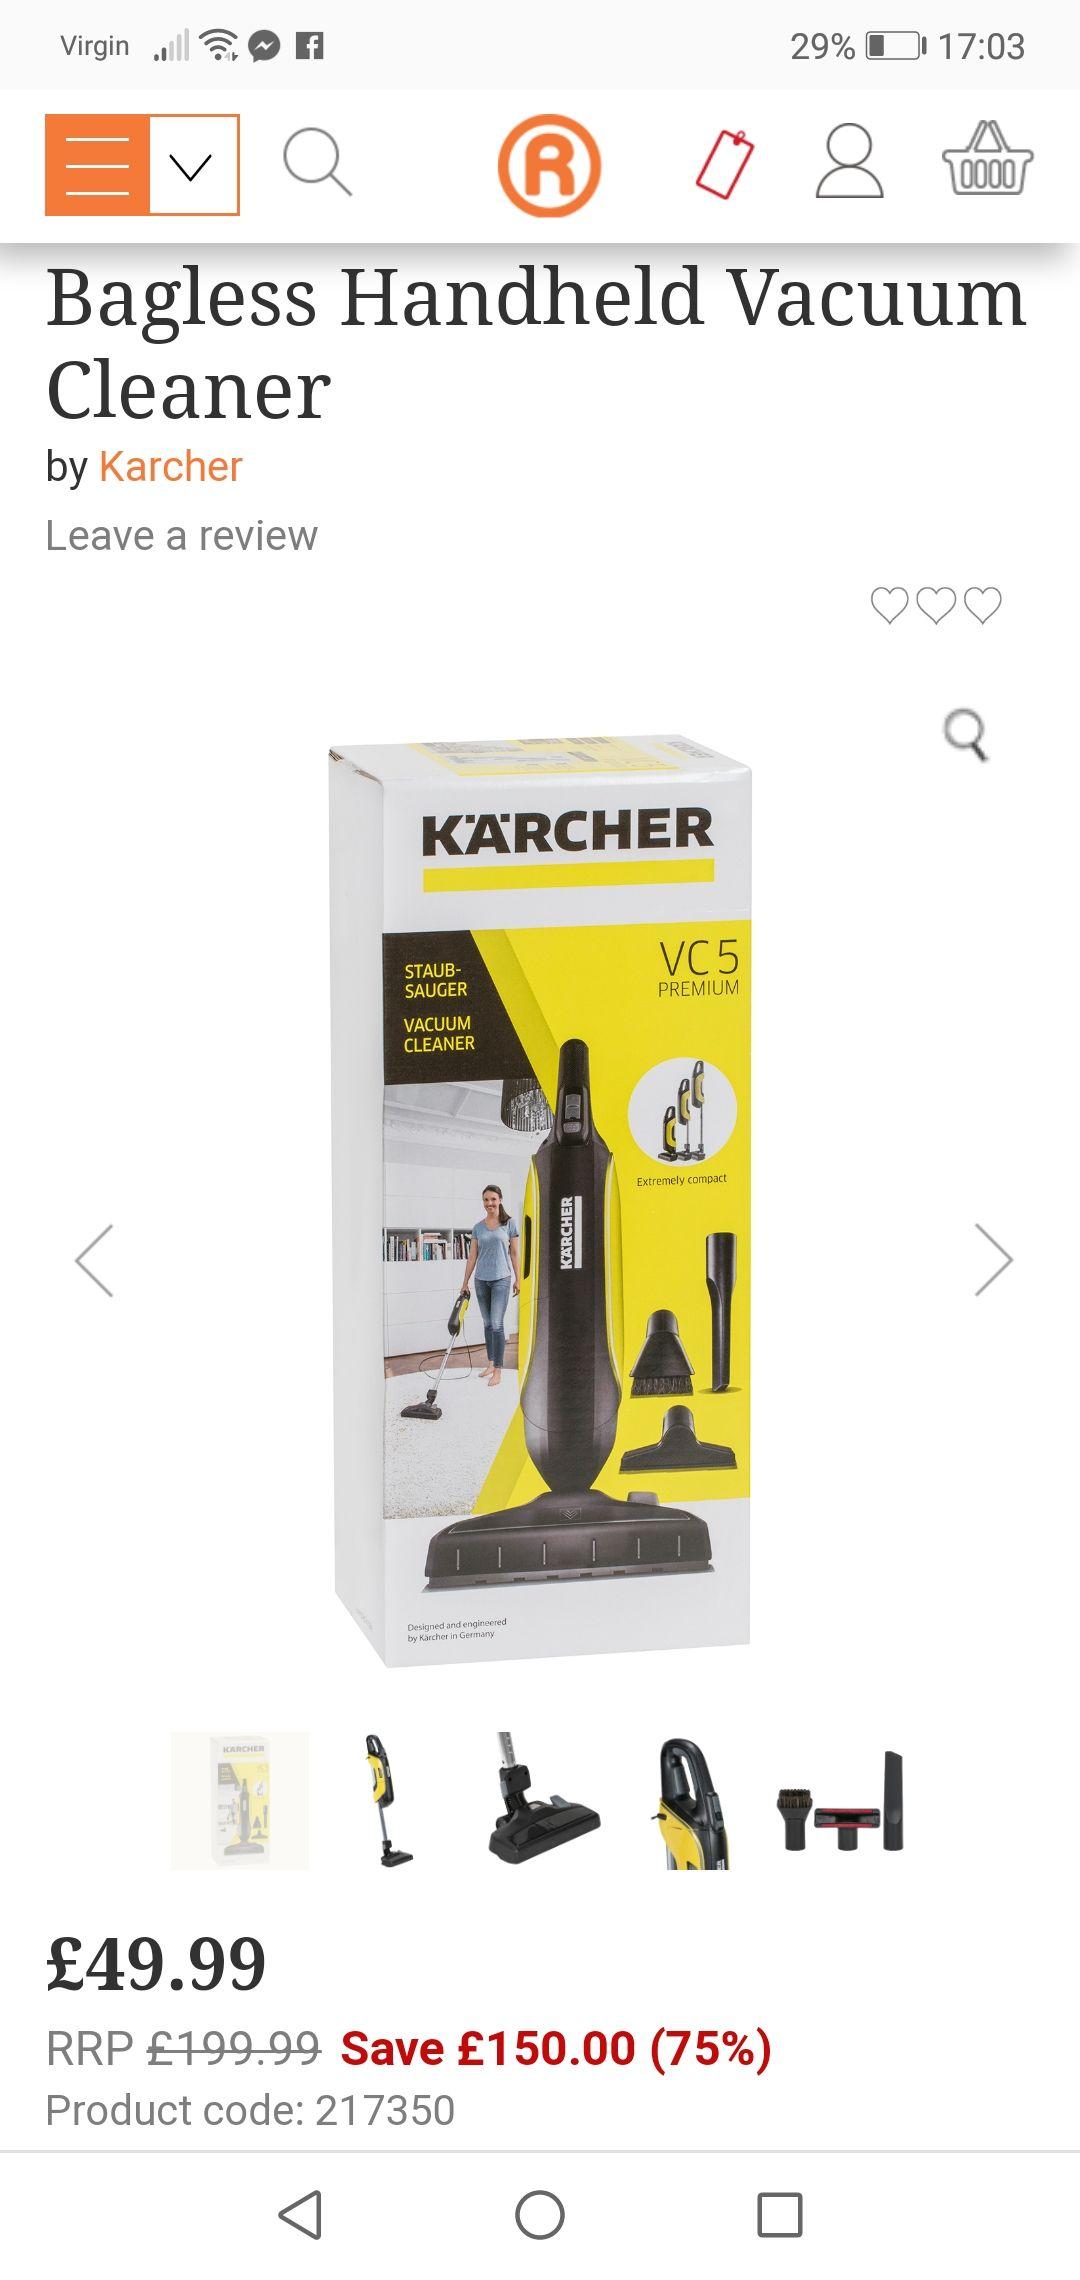 Katcher bagless hoover/vacum cleaner (Instore only) - £49.99 @ The Range